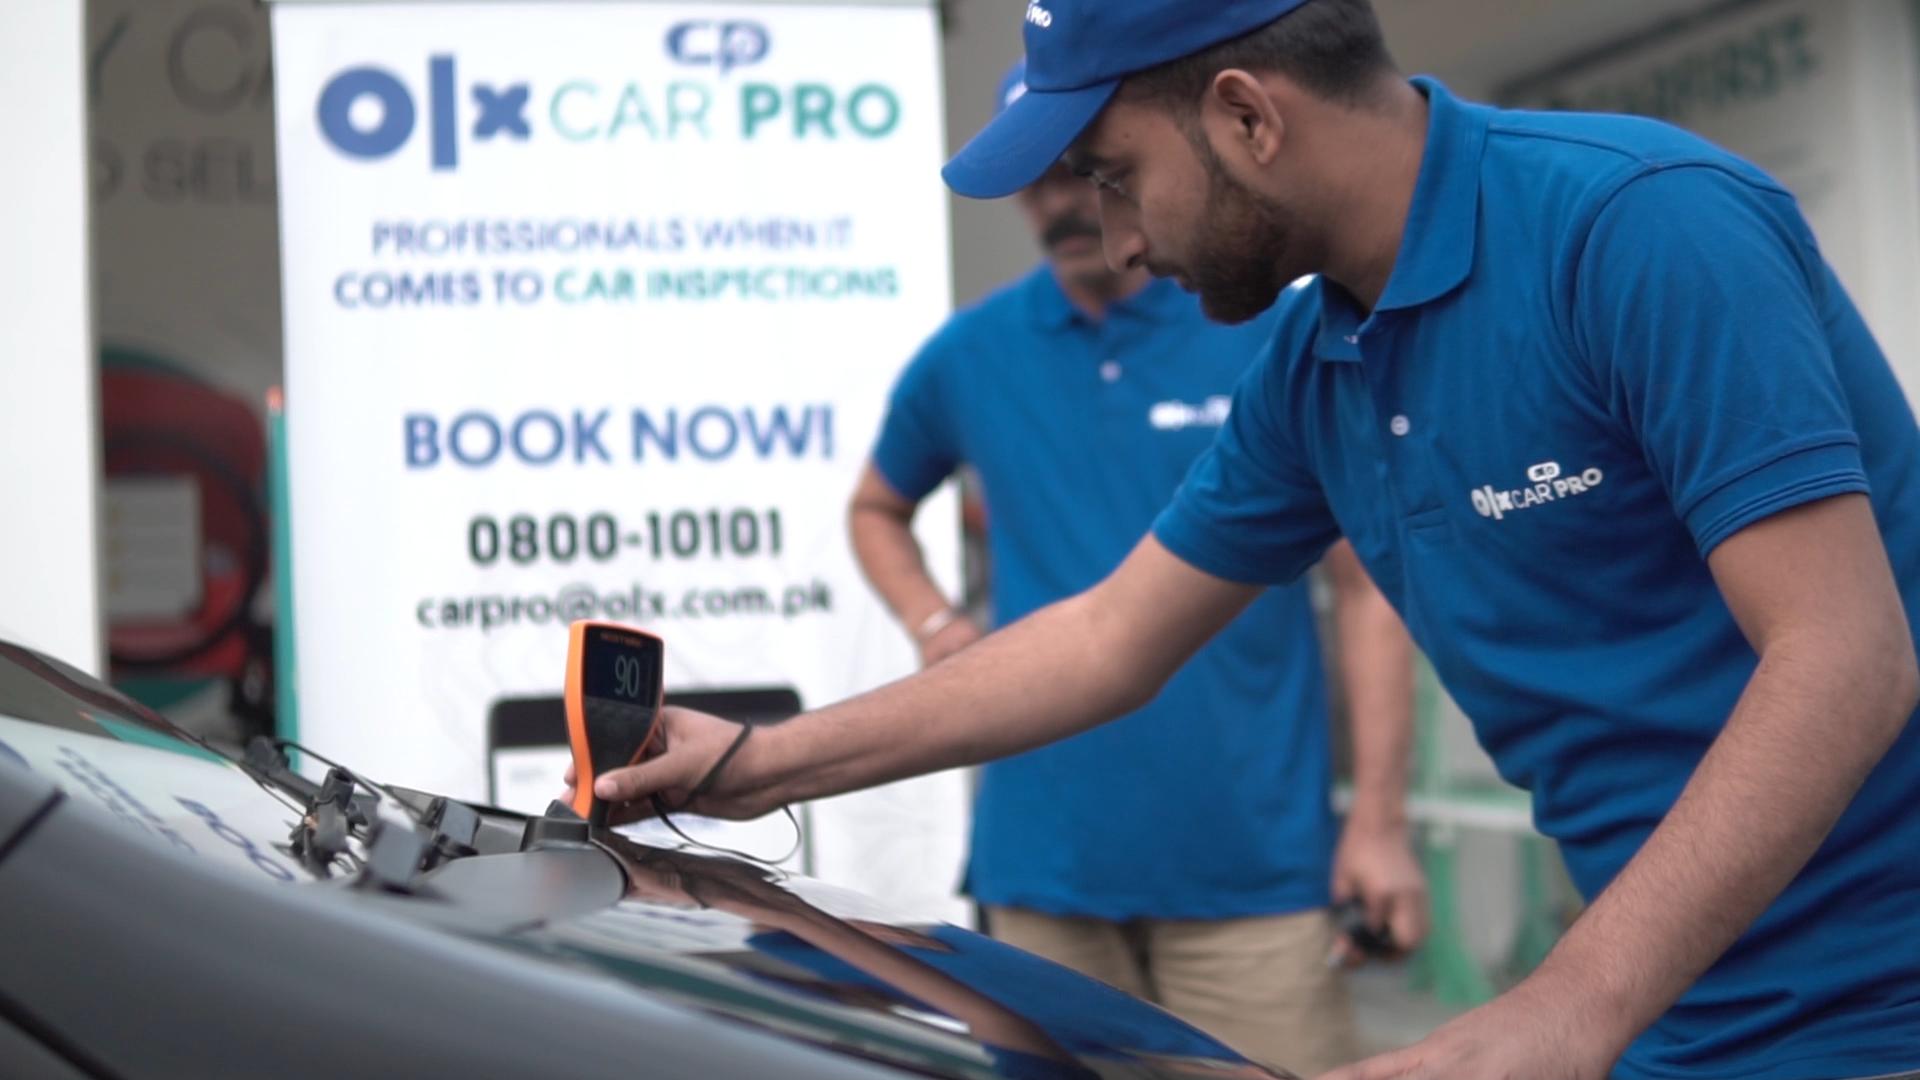 Olx car pro inspection service